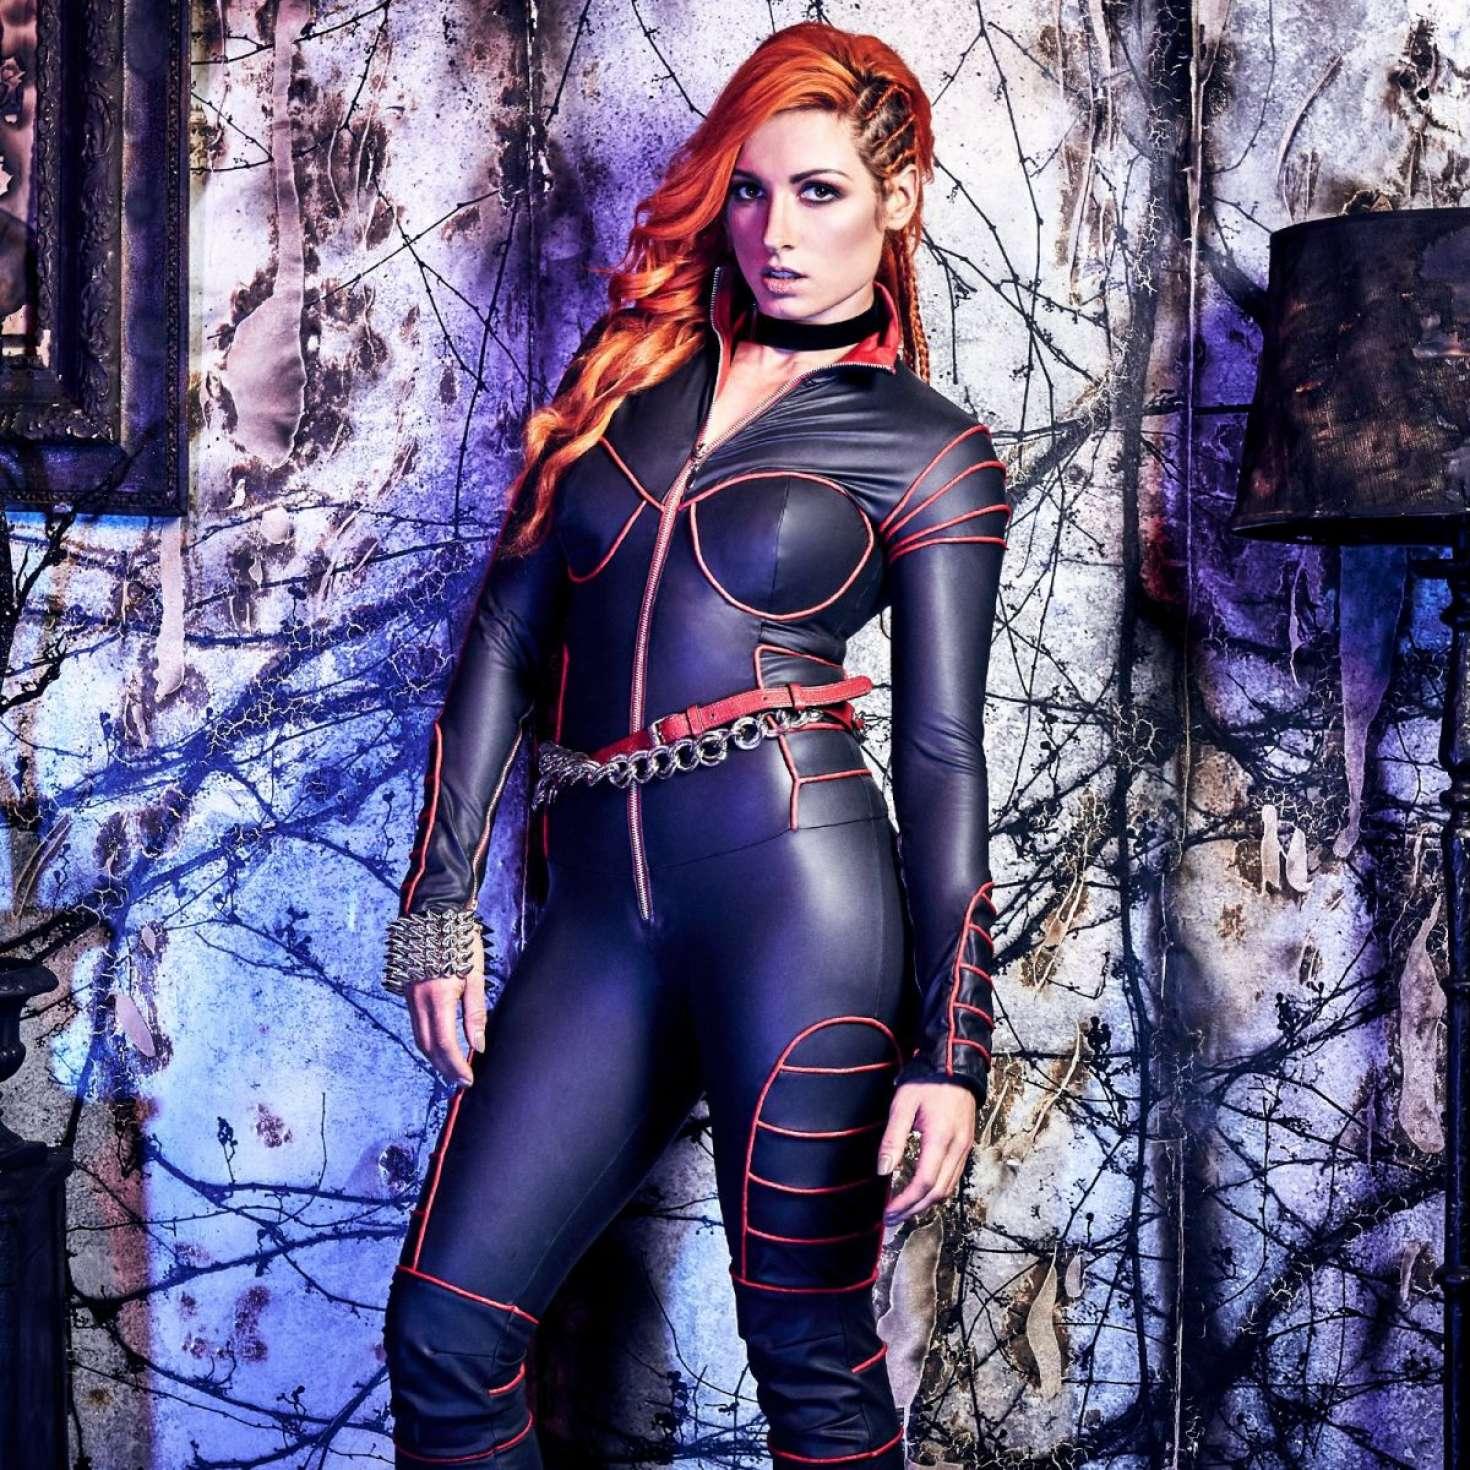 WWE Divas Alexa Bliss, Nikki Bella and Naomi Photoshoot in